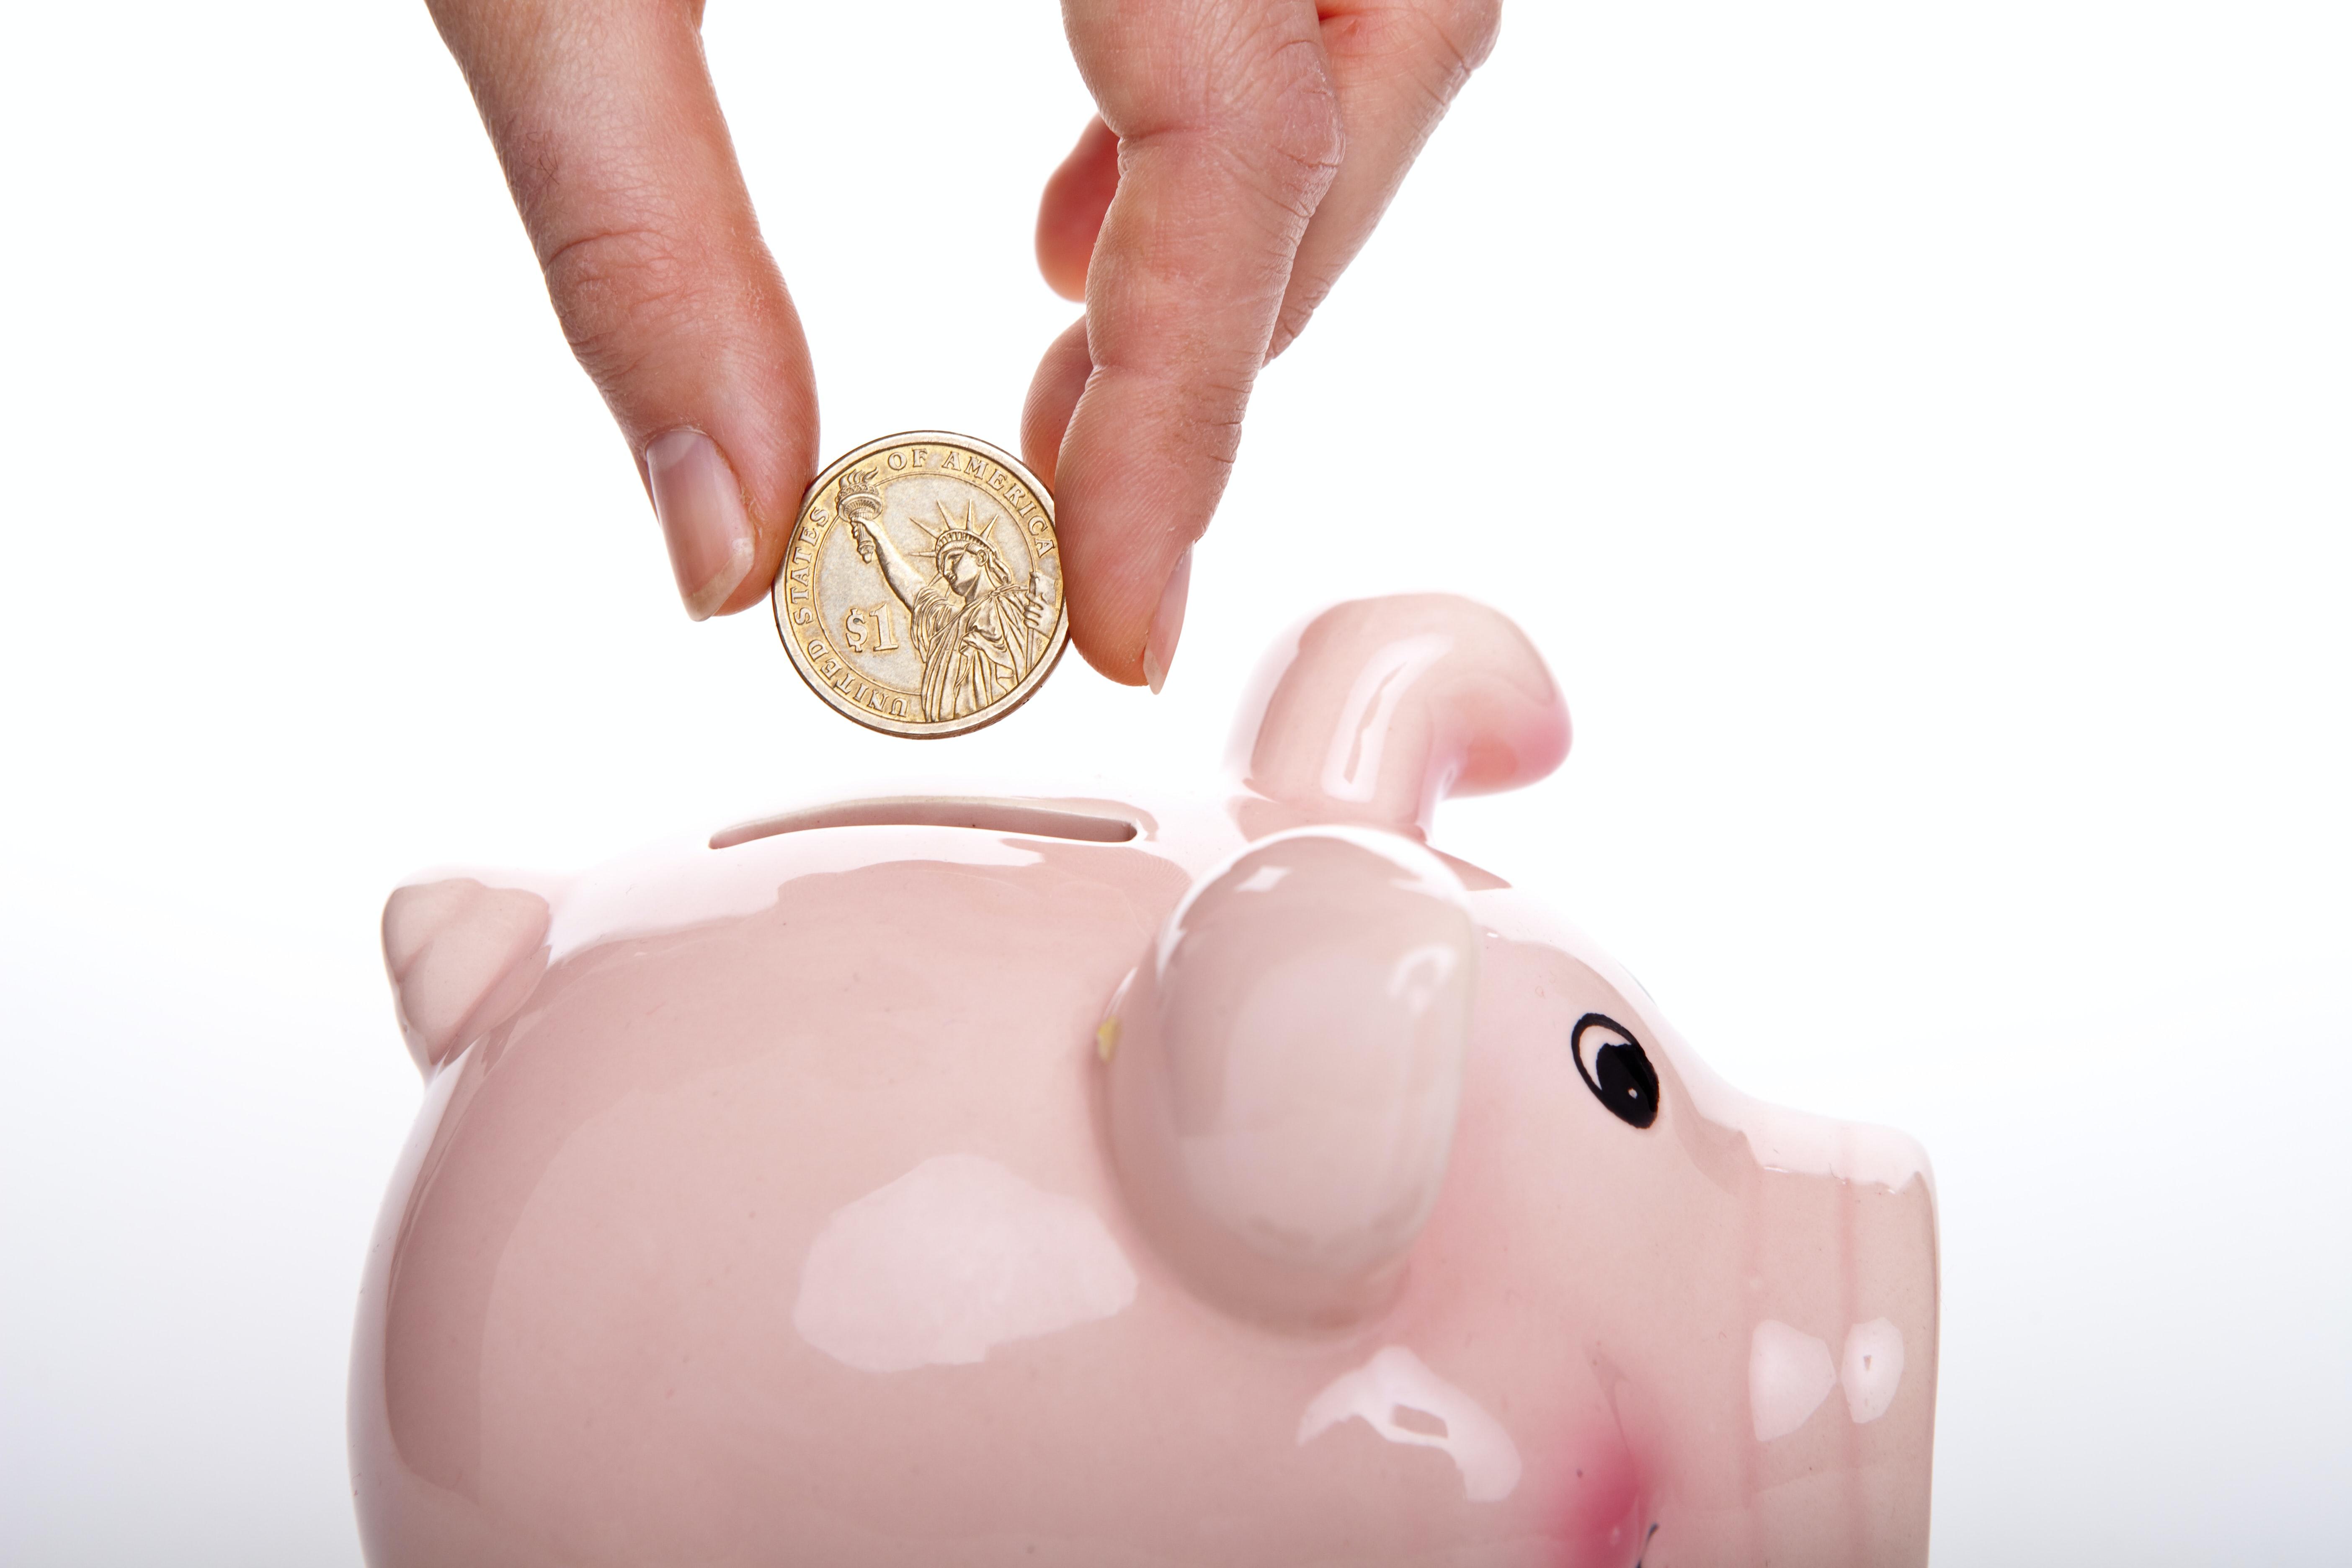 U.S.VETS & Edward Jones Present: Budgeting & Financial Independence